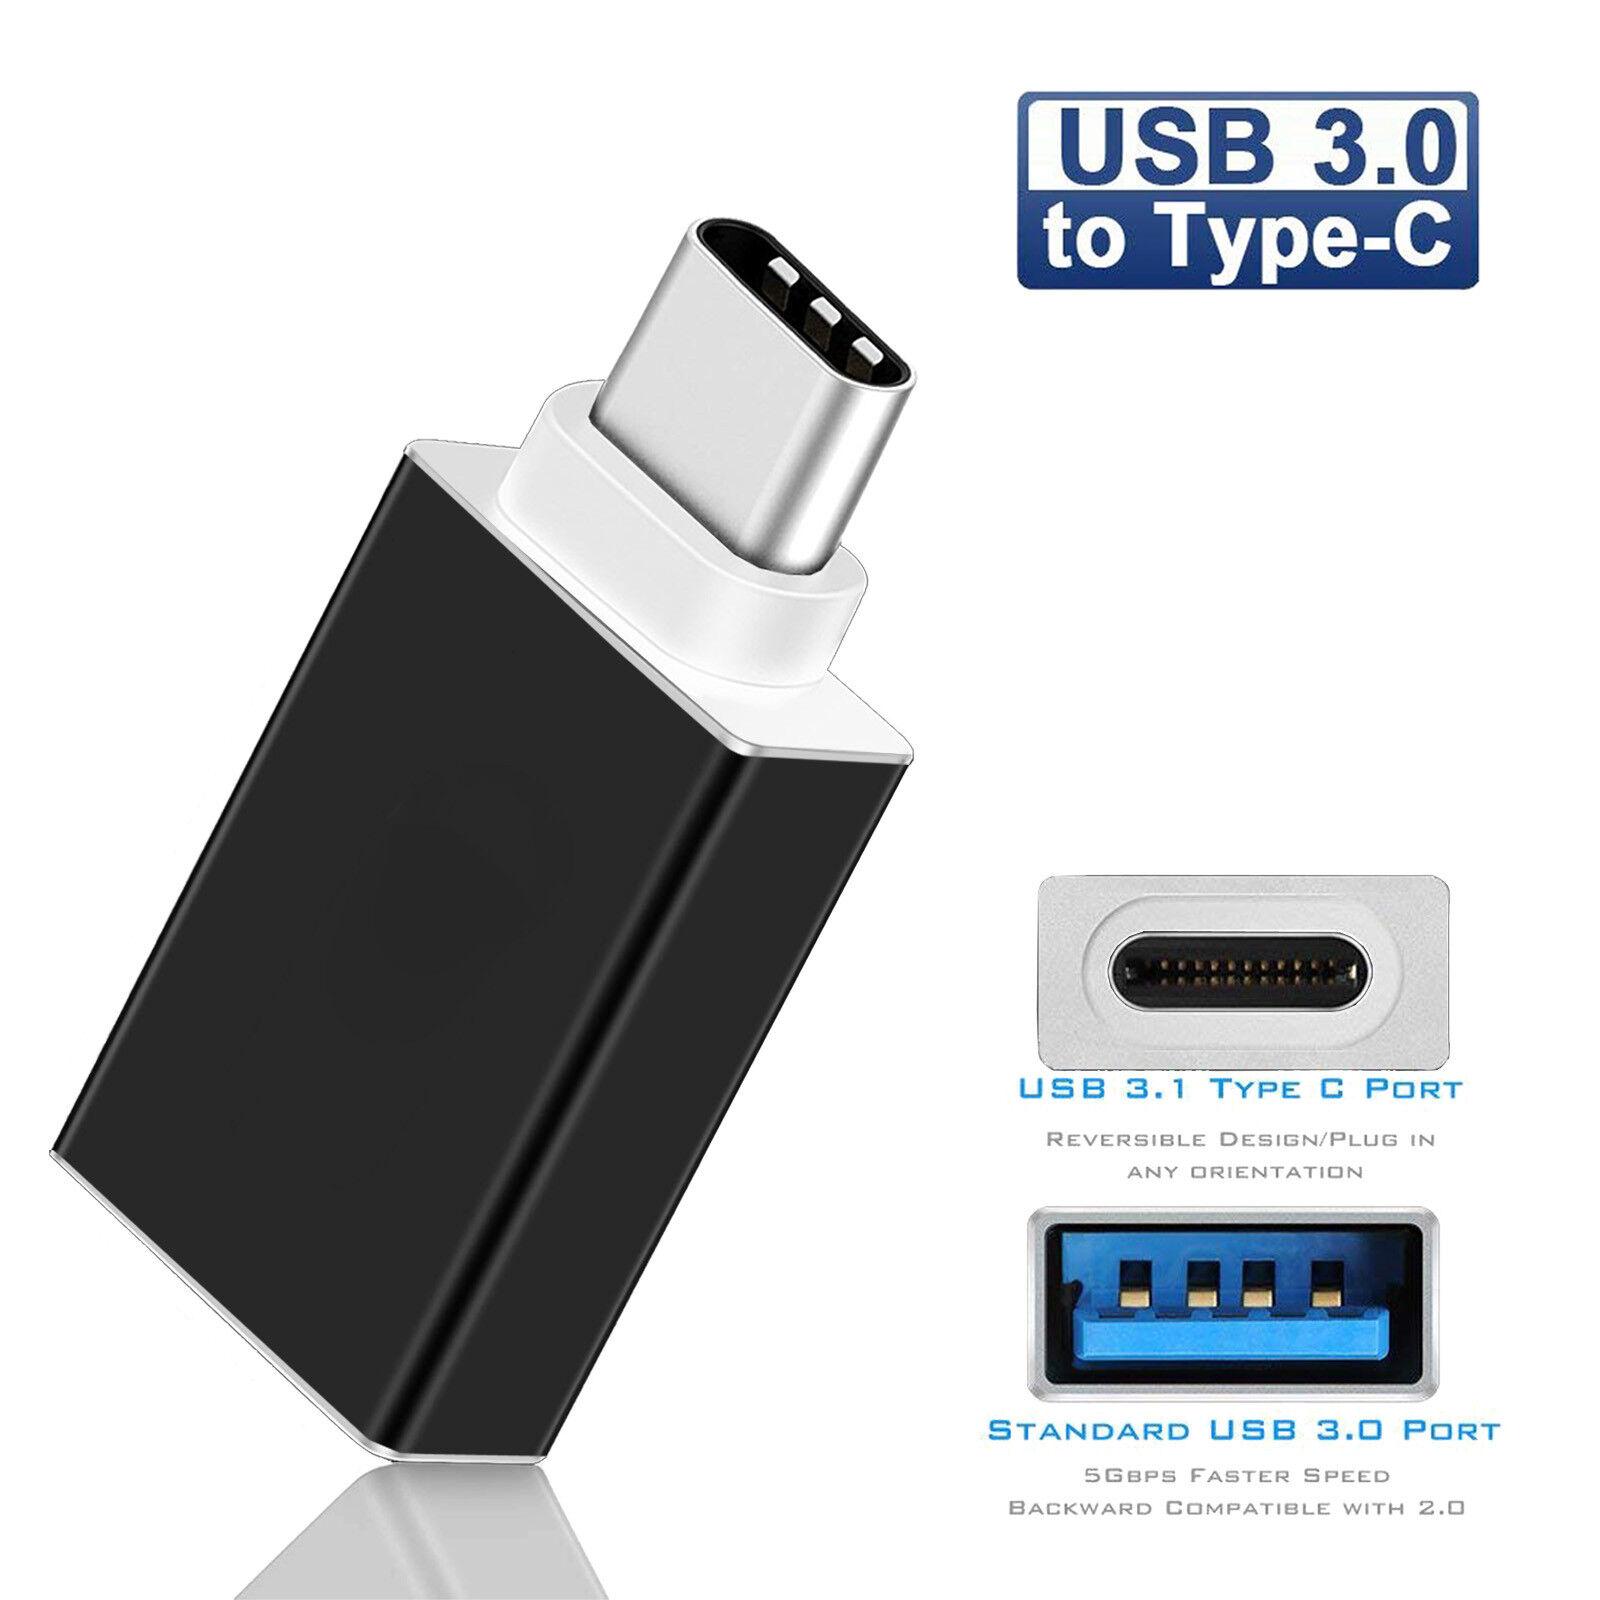 AU-NEW USB 3.1 Type C Male to USB 3.0 A Female Convertor OTG